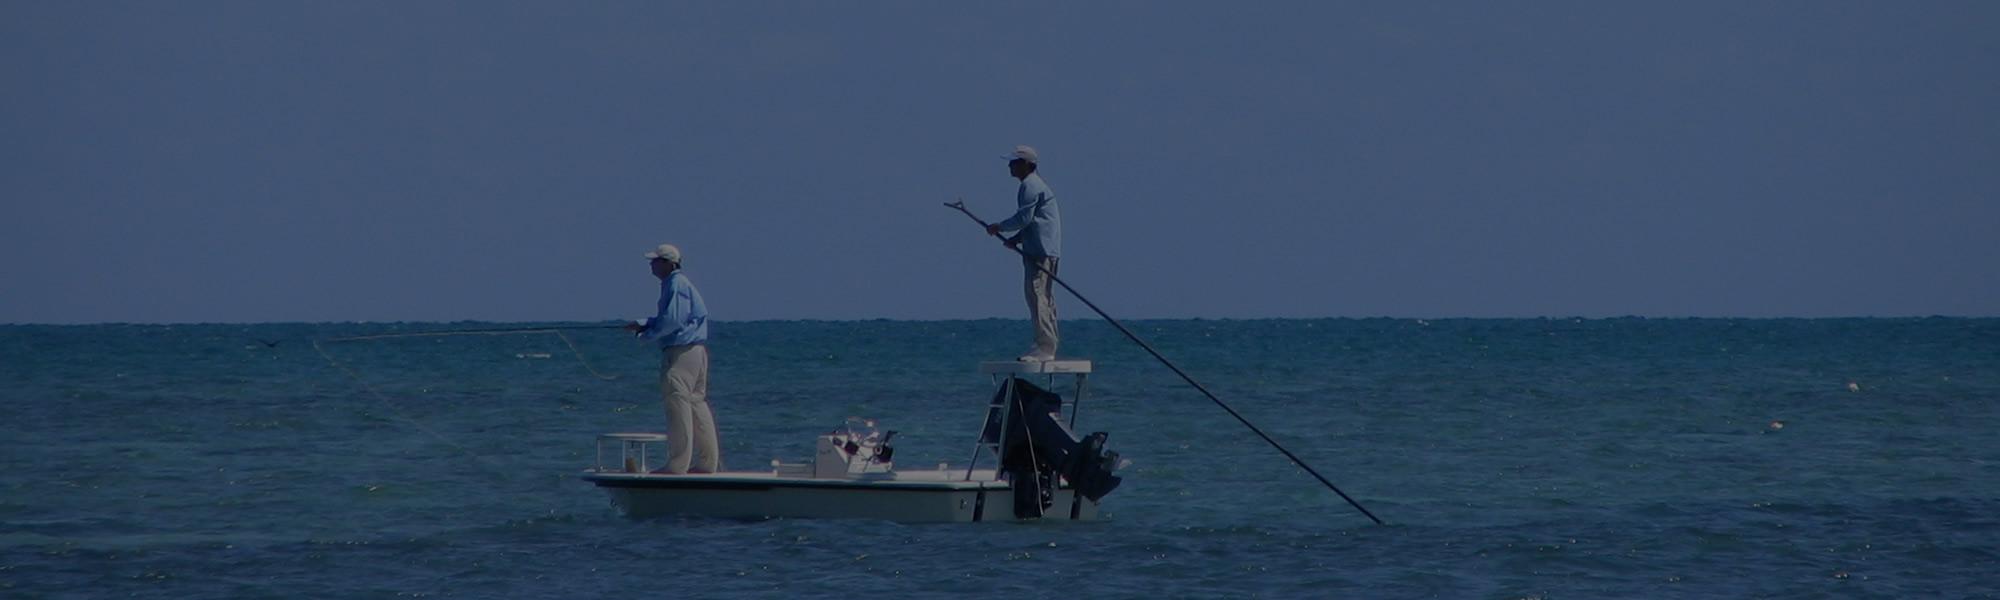 Florida Flats Fishing